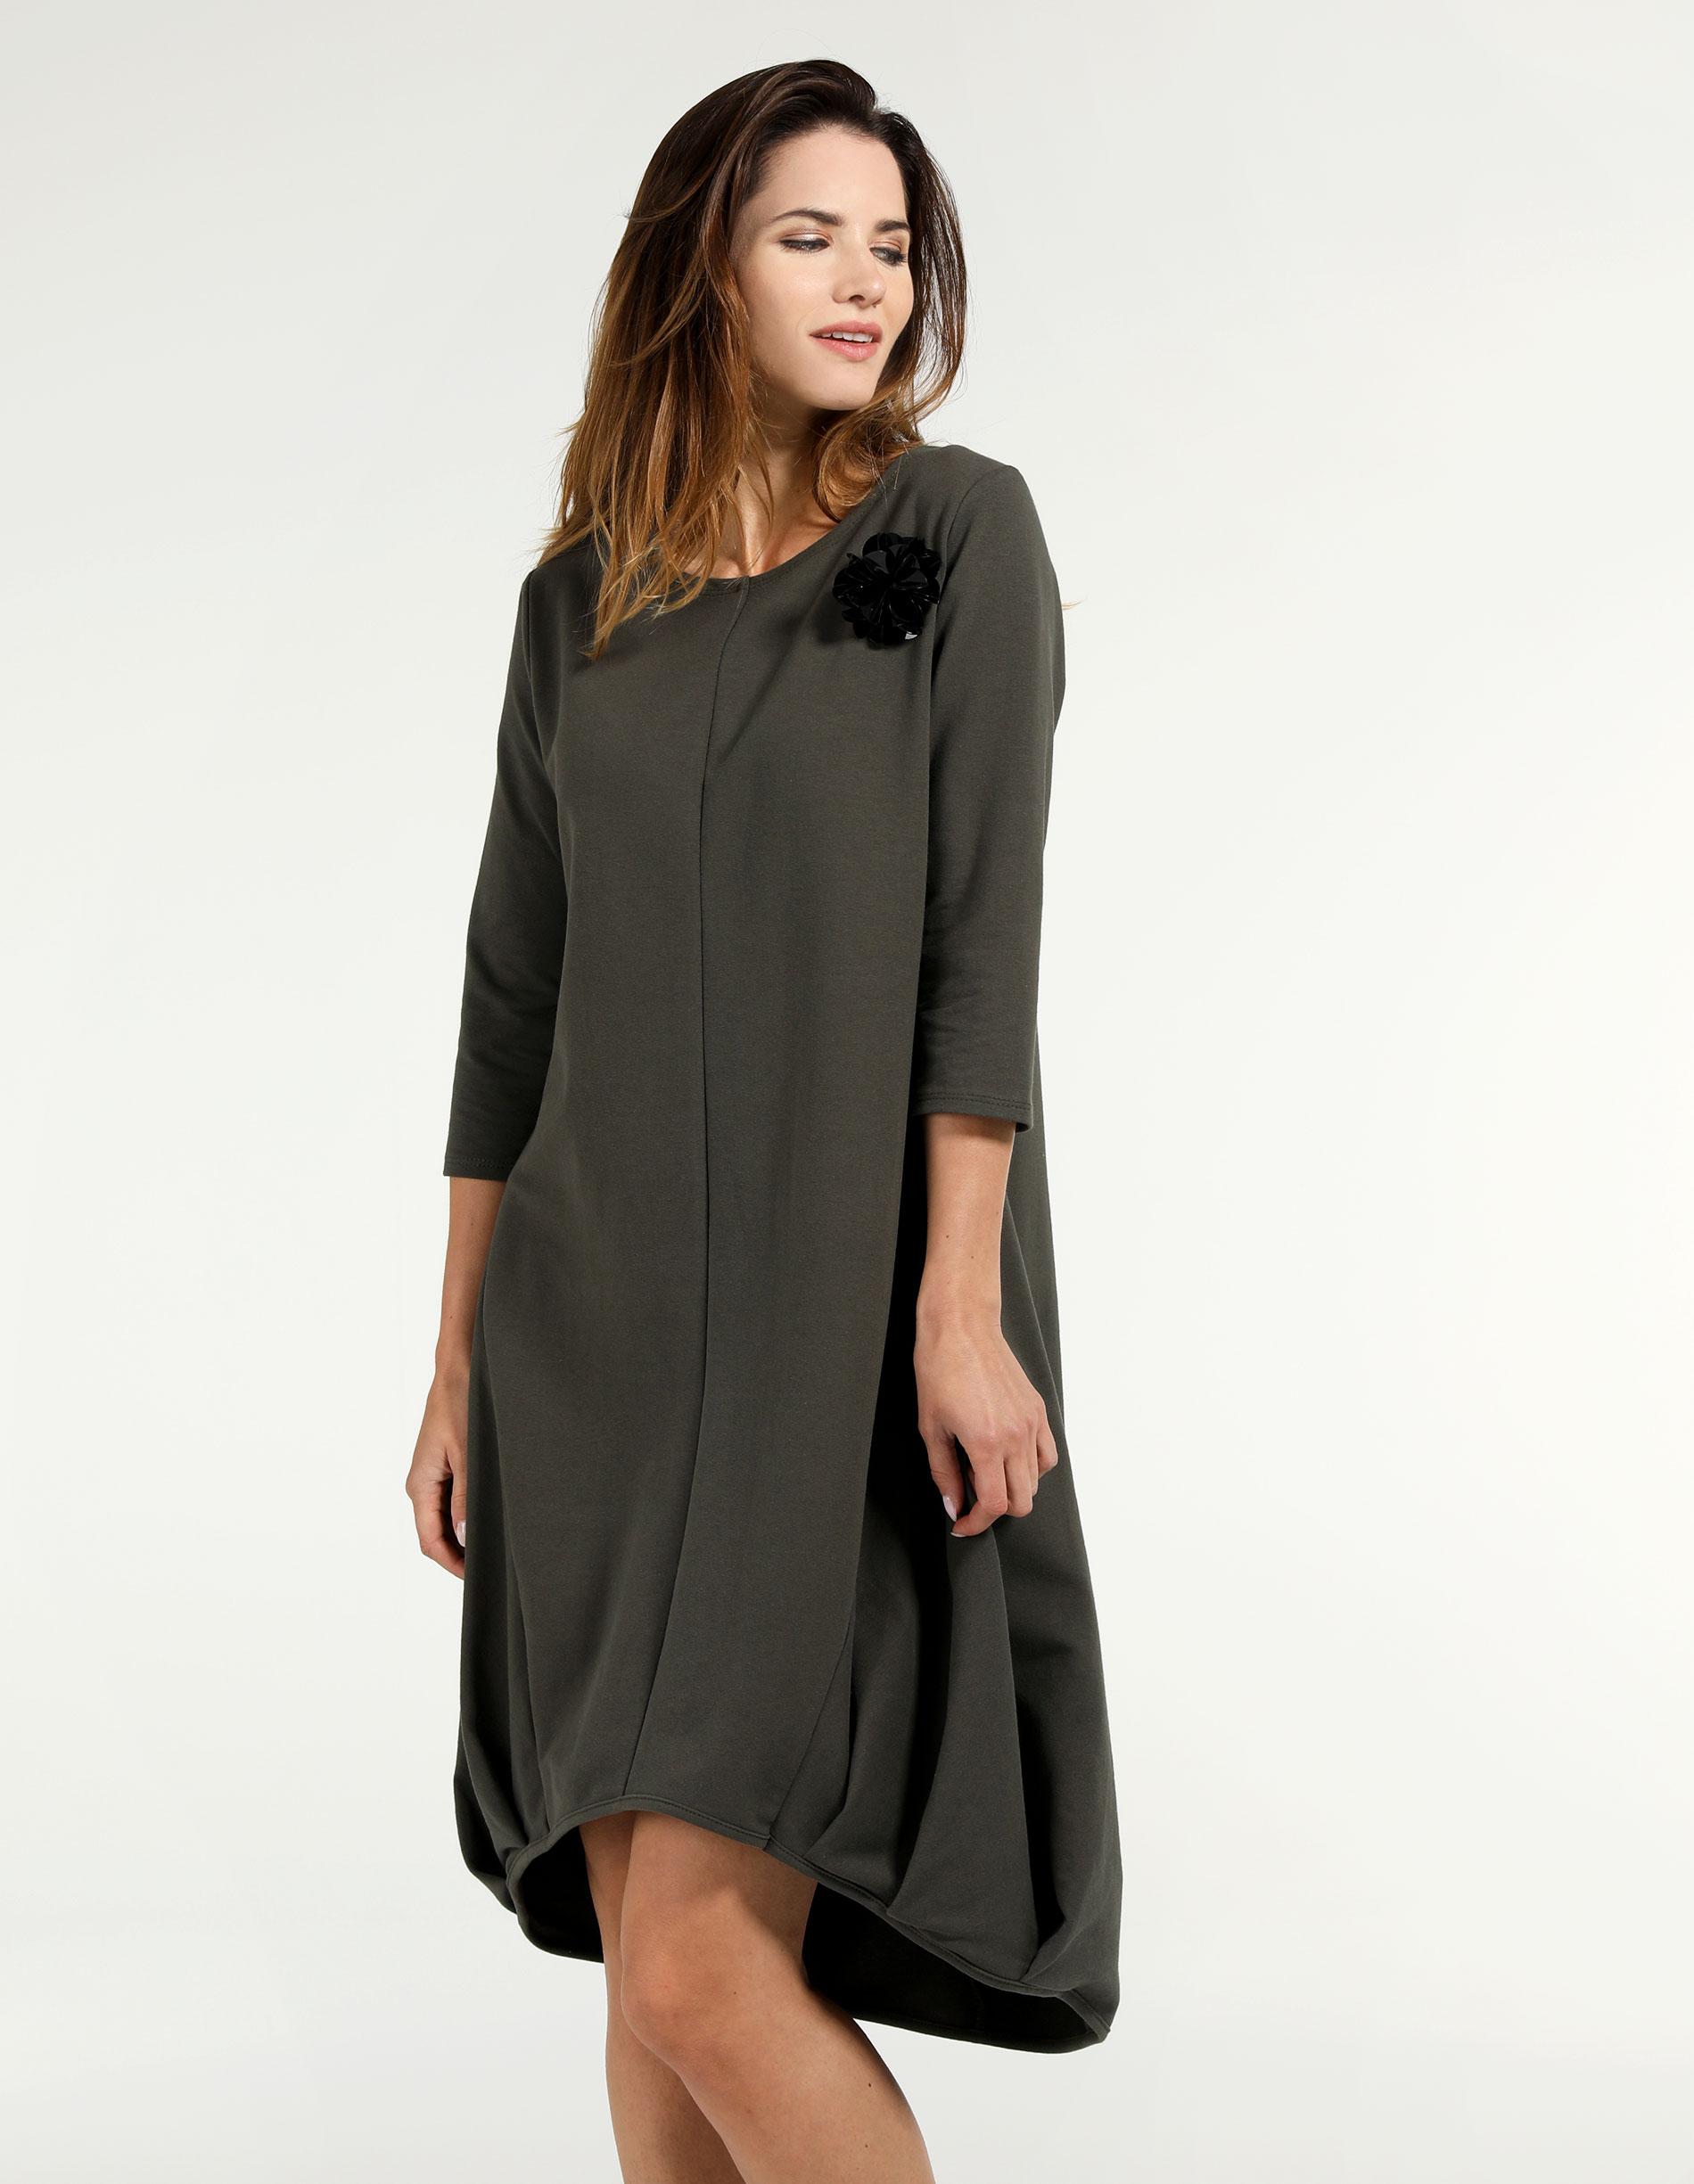 Sukienka - 30-87137 MILI - Unisono